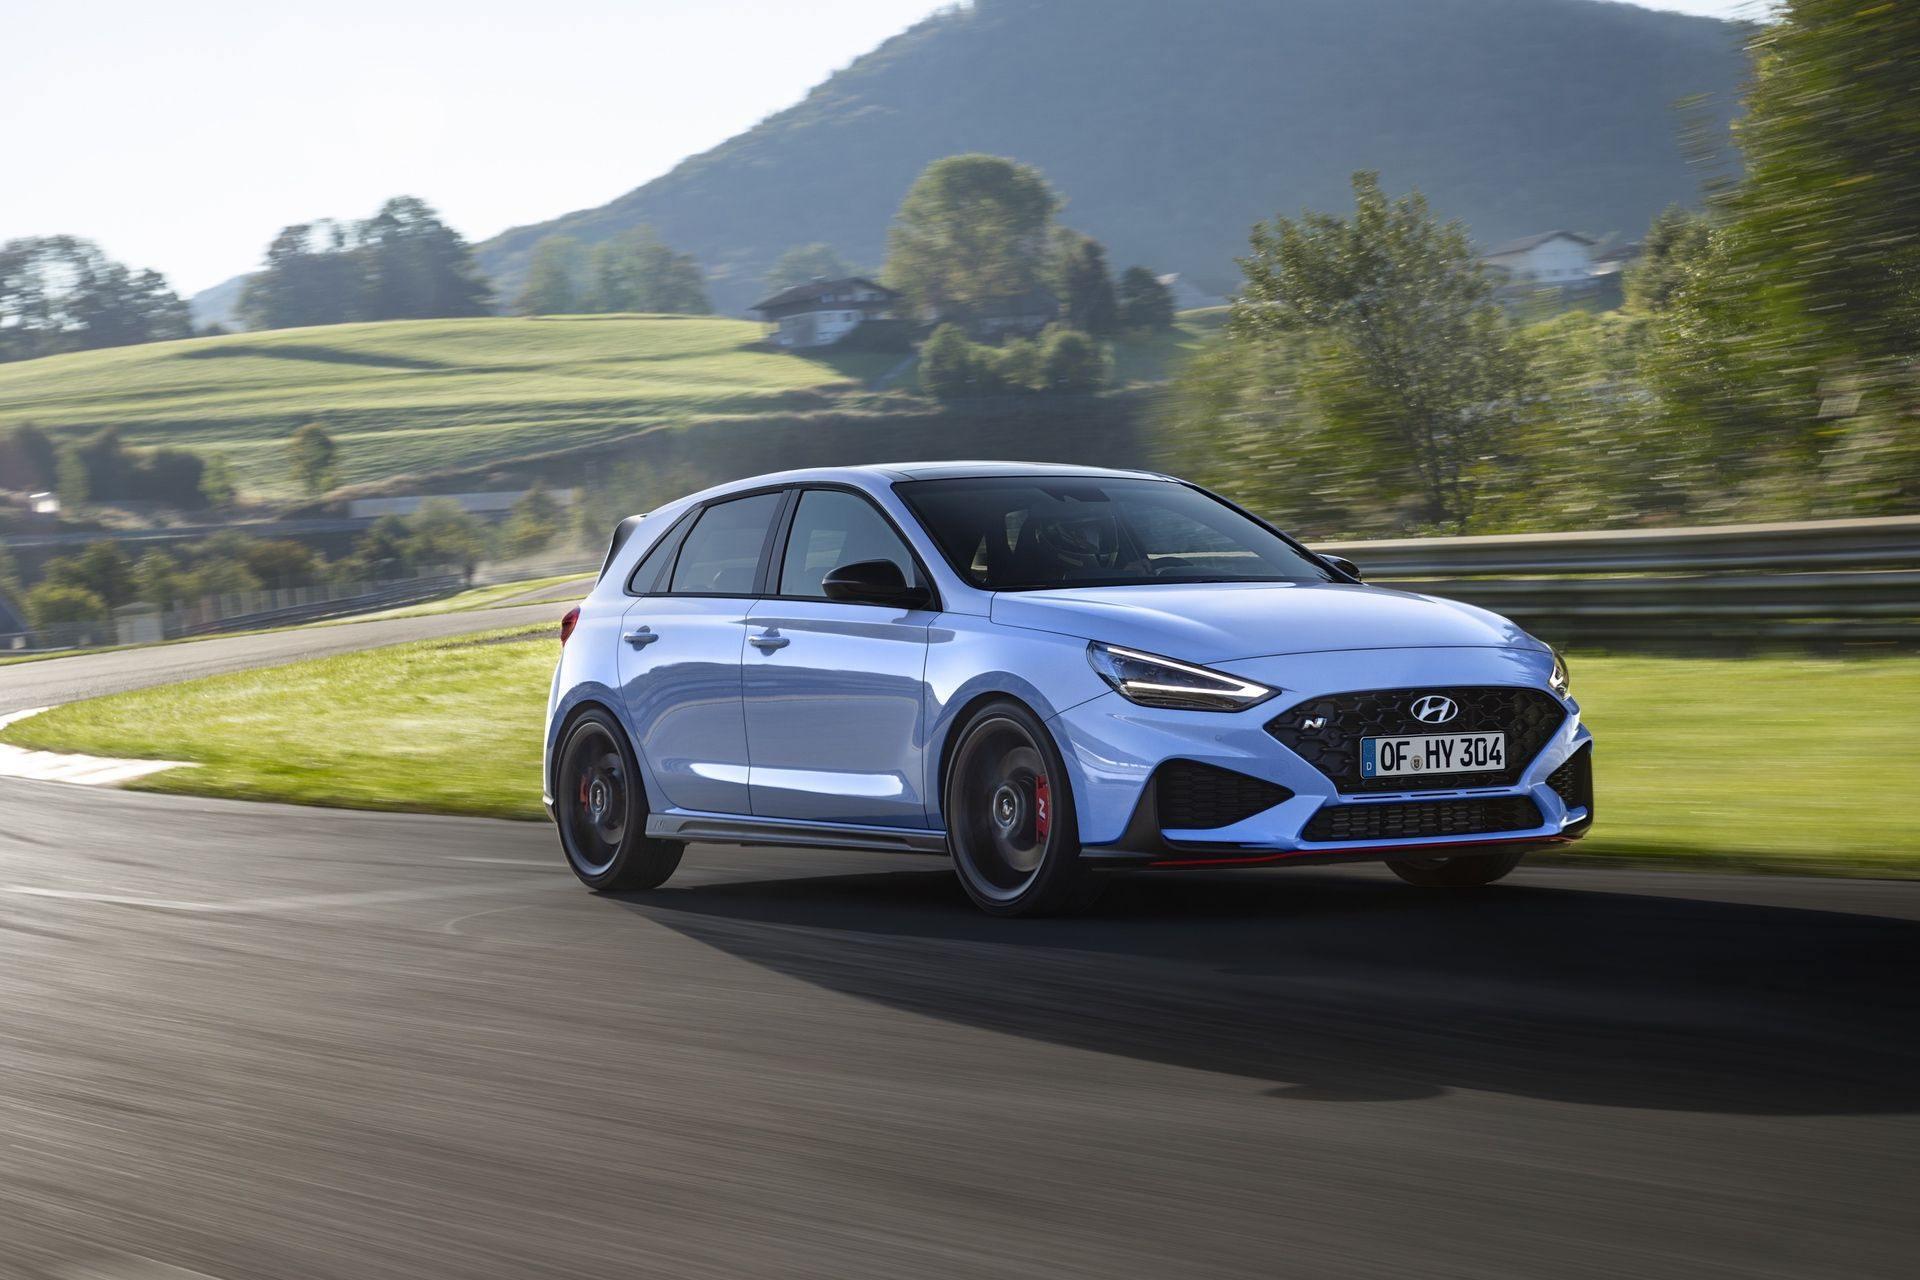 Hyundai i30 N Performance (2021) lifting